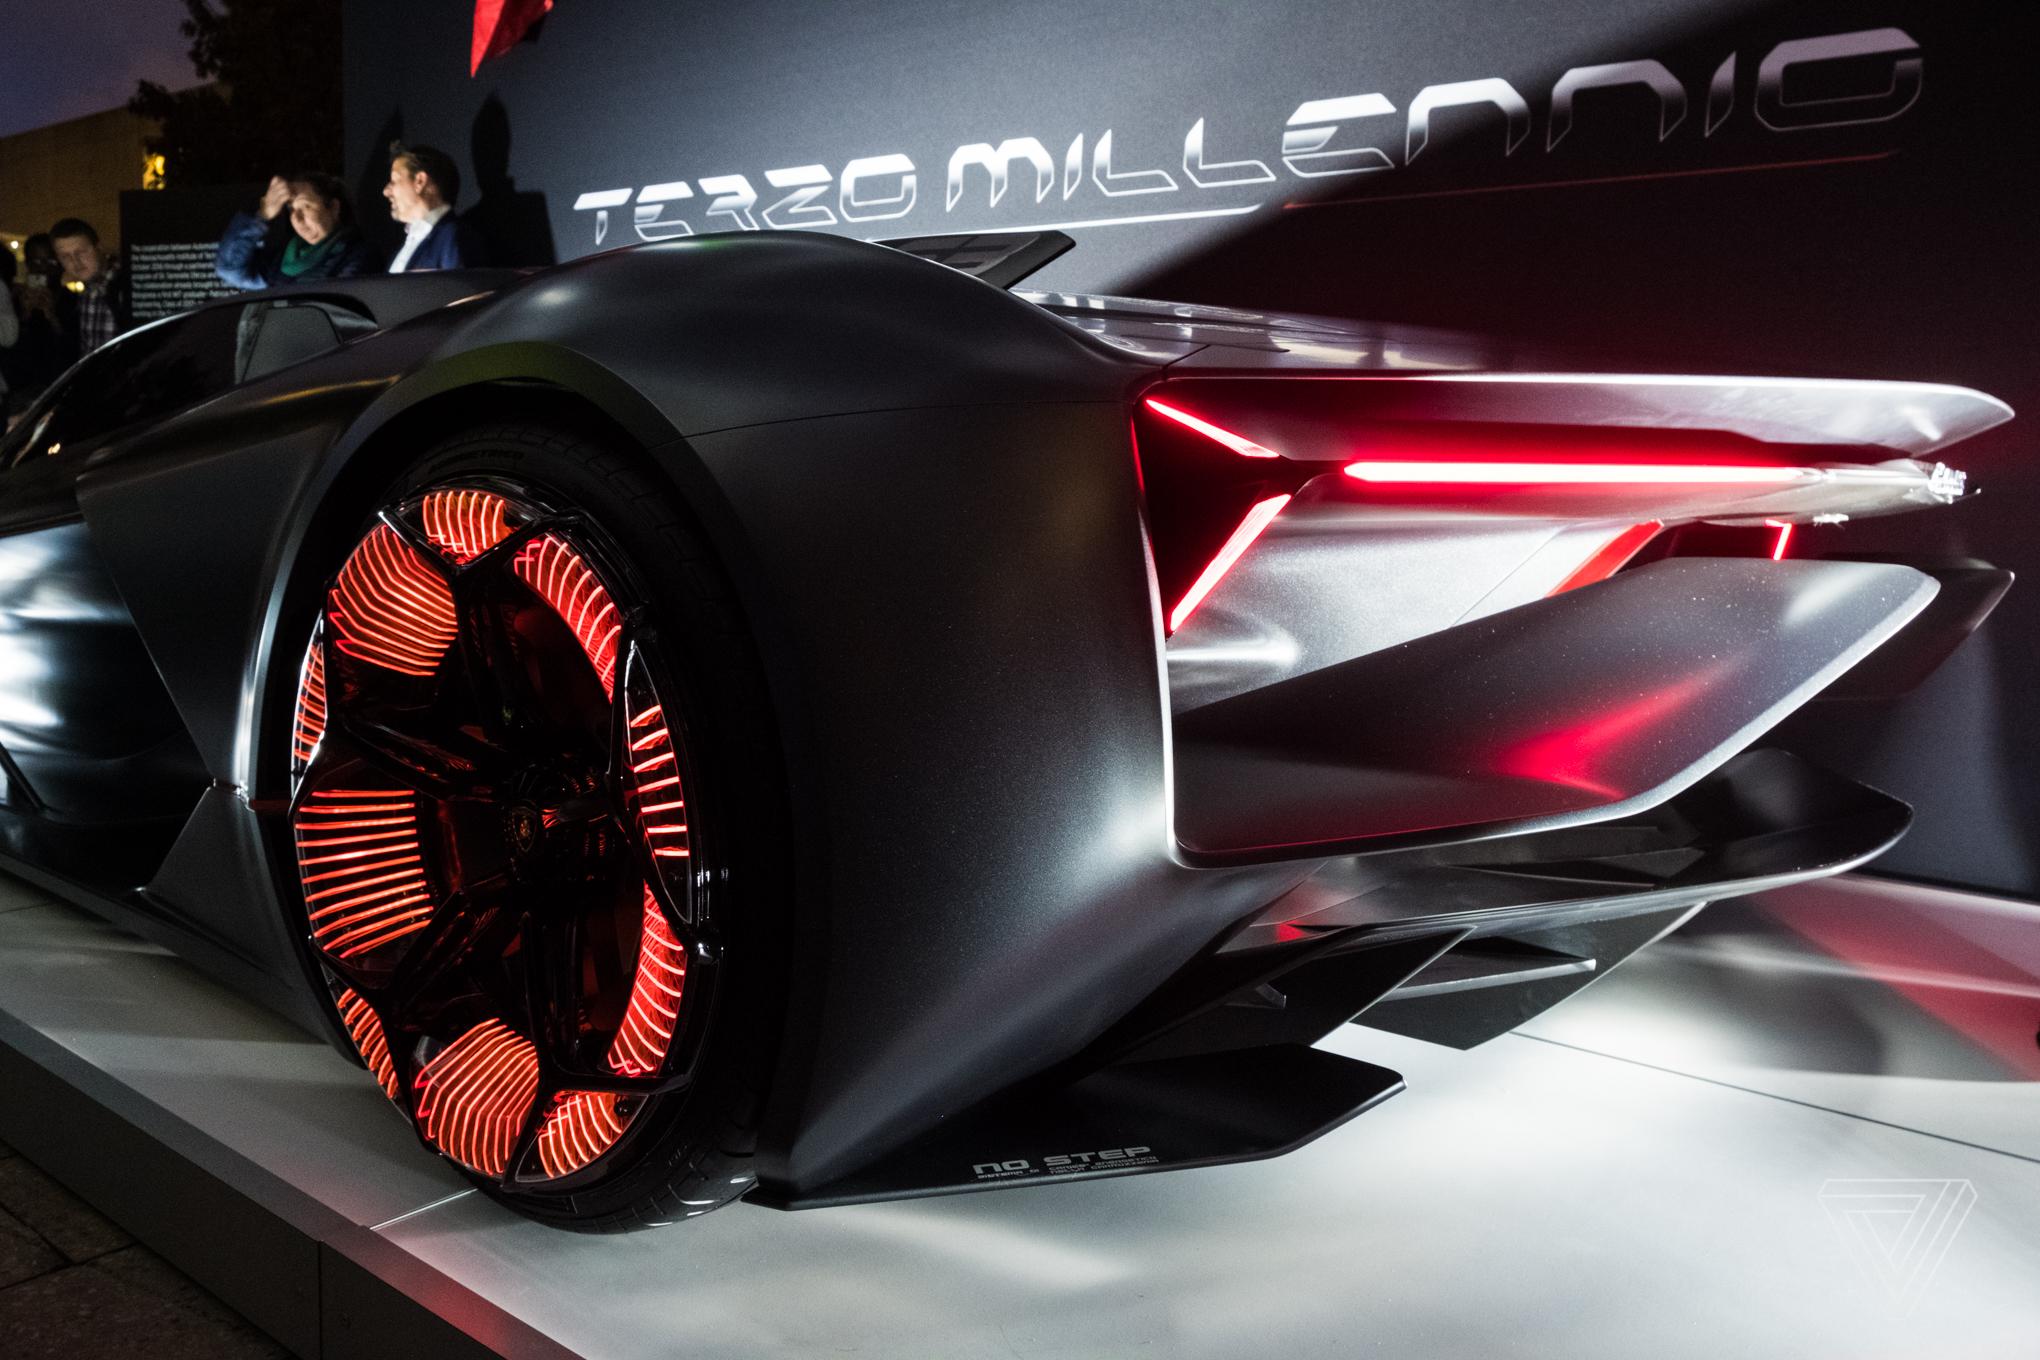 Engine Live 3d Wallpaper The Lamborghini Terzo Millennio Concept Is A Lightning